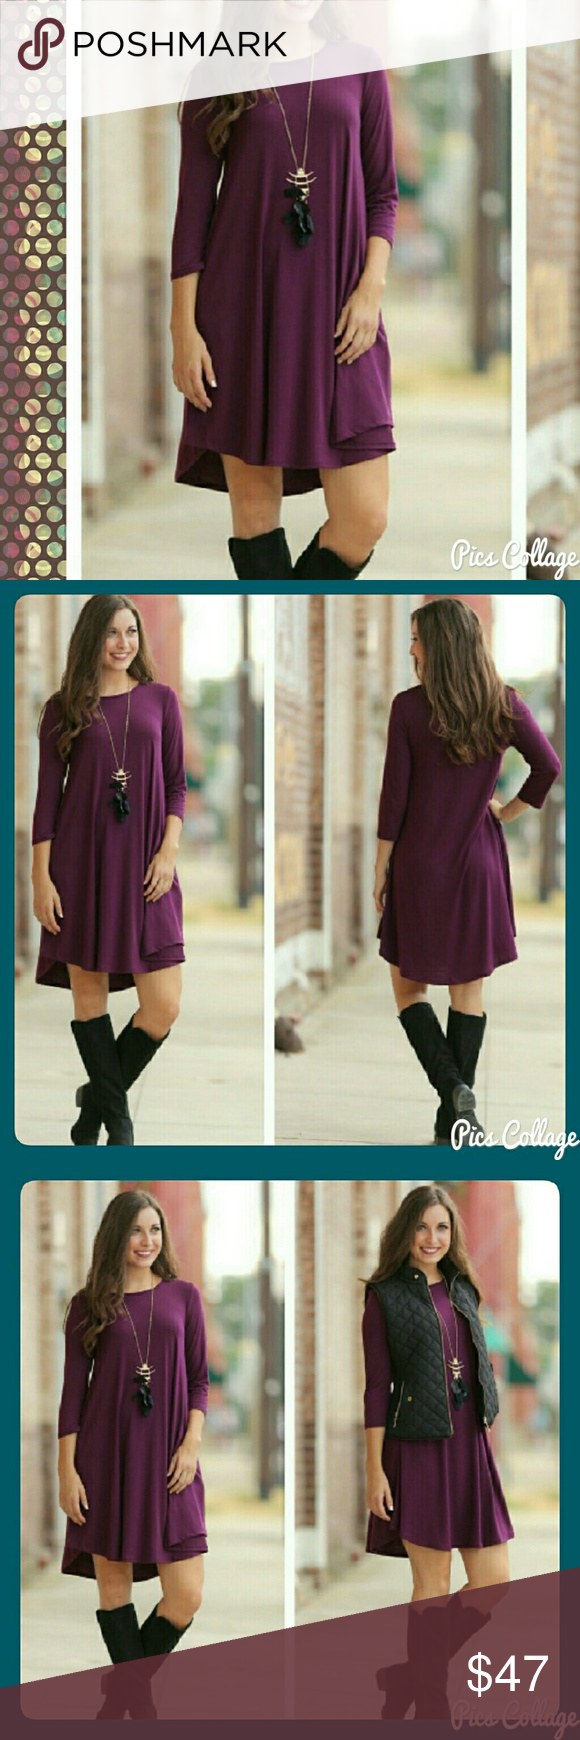 Plum 3/4 Sleeve Tunic/Dress w/Pockets Soft, comfy, true to size ...